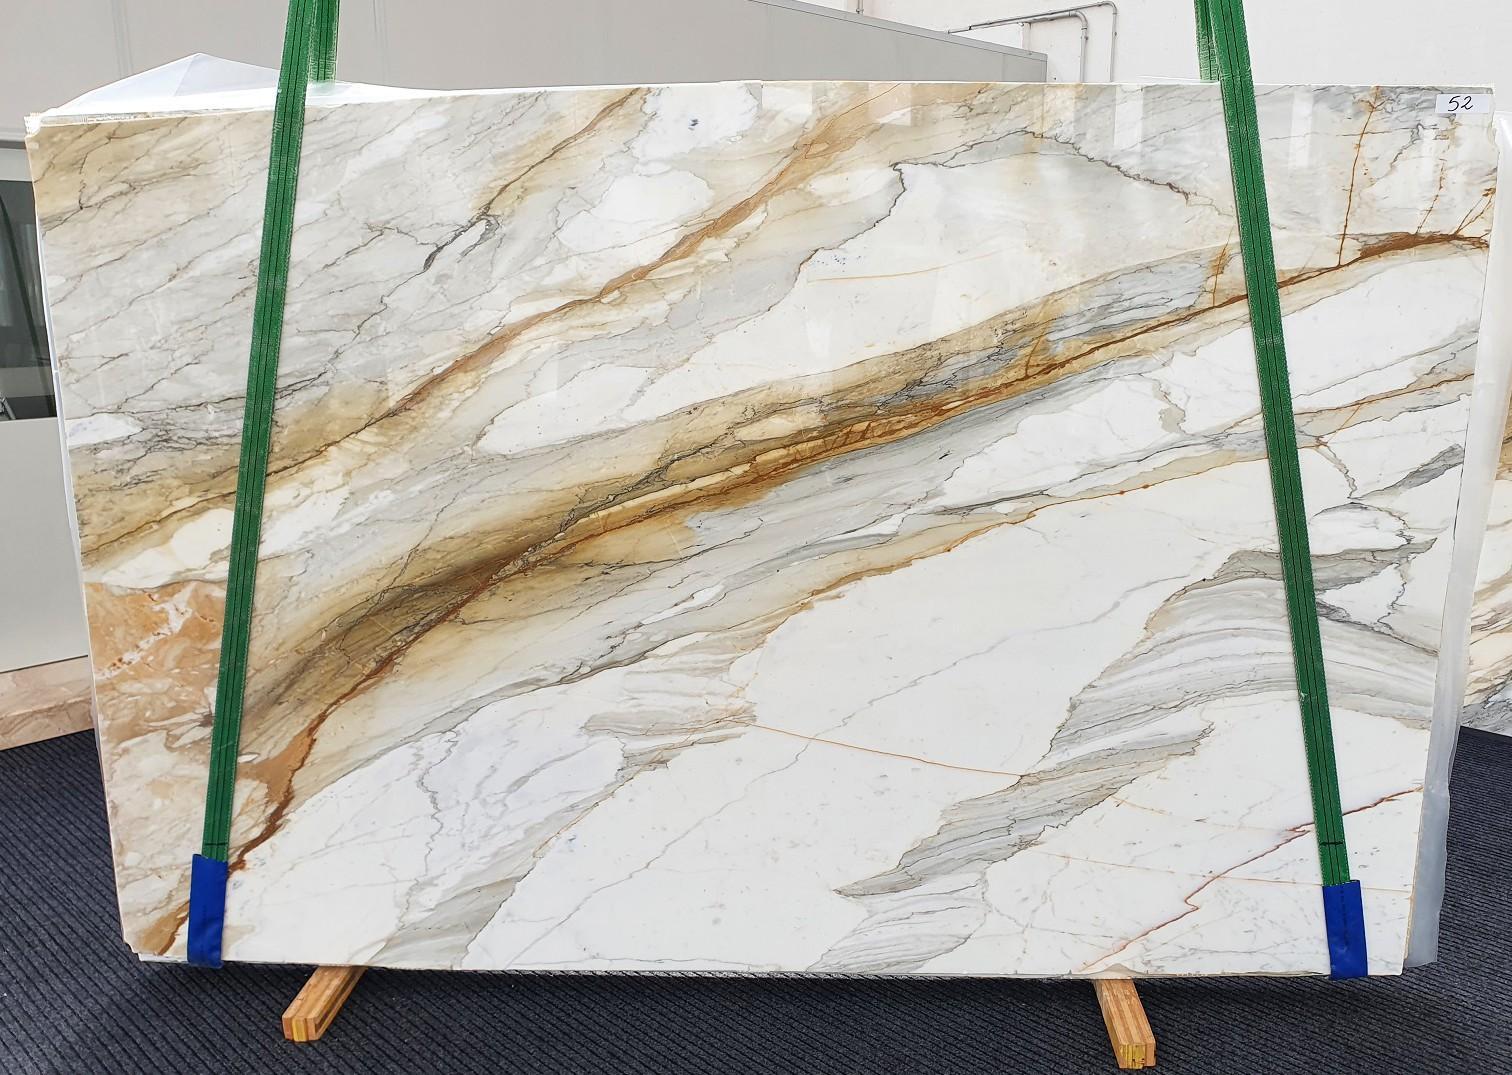 CALACATTA MACCHIAVECCHIA Suministro Veneto (Italia) de planchas pulidas en mármol natural 1354 , Slab #52